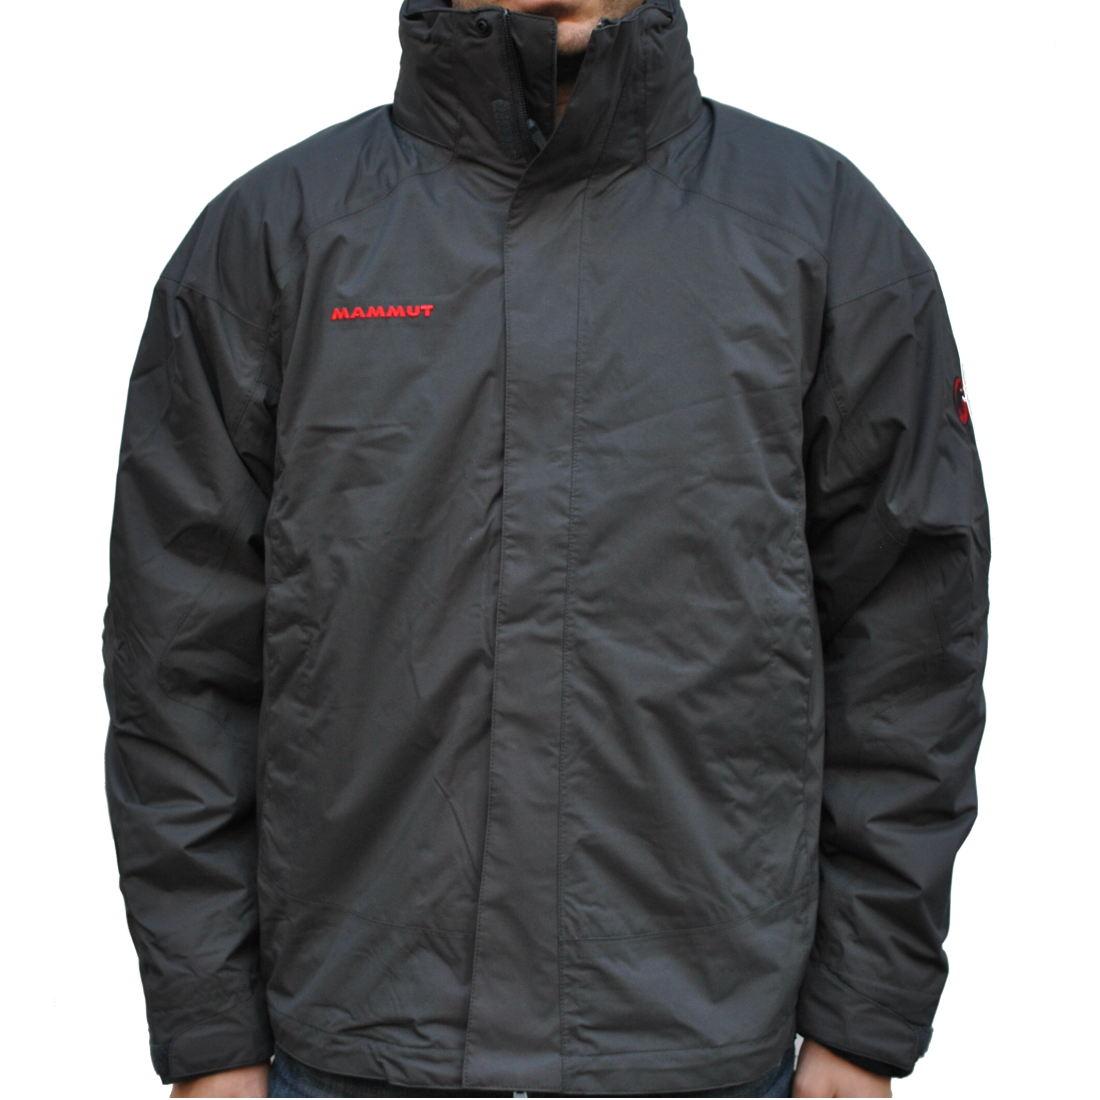 mammut genesis 2 s jacket herren winterjacke gaphite jacke outdoor ebay. Black Bedroom Furniture Sets. Home Design Ideas